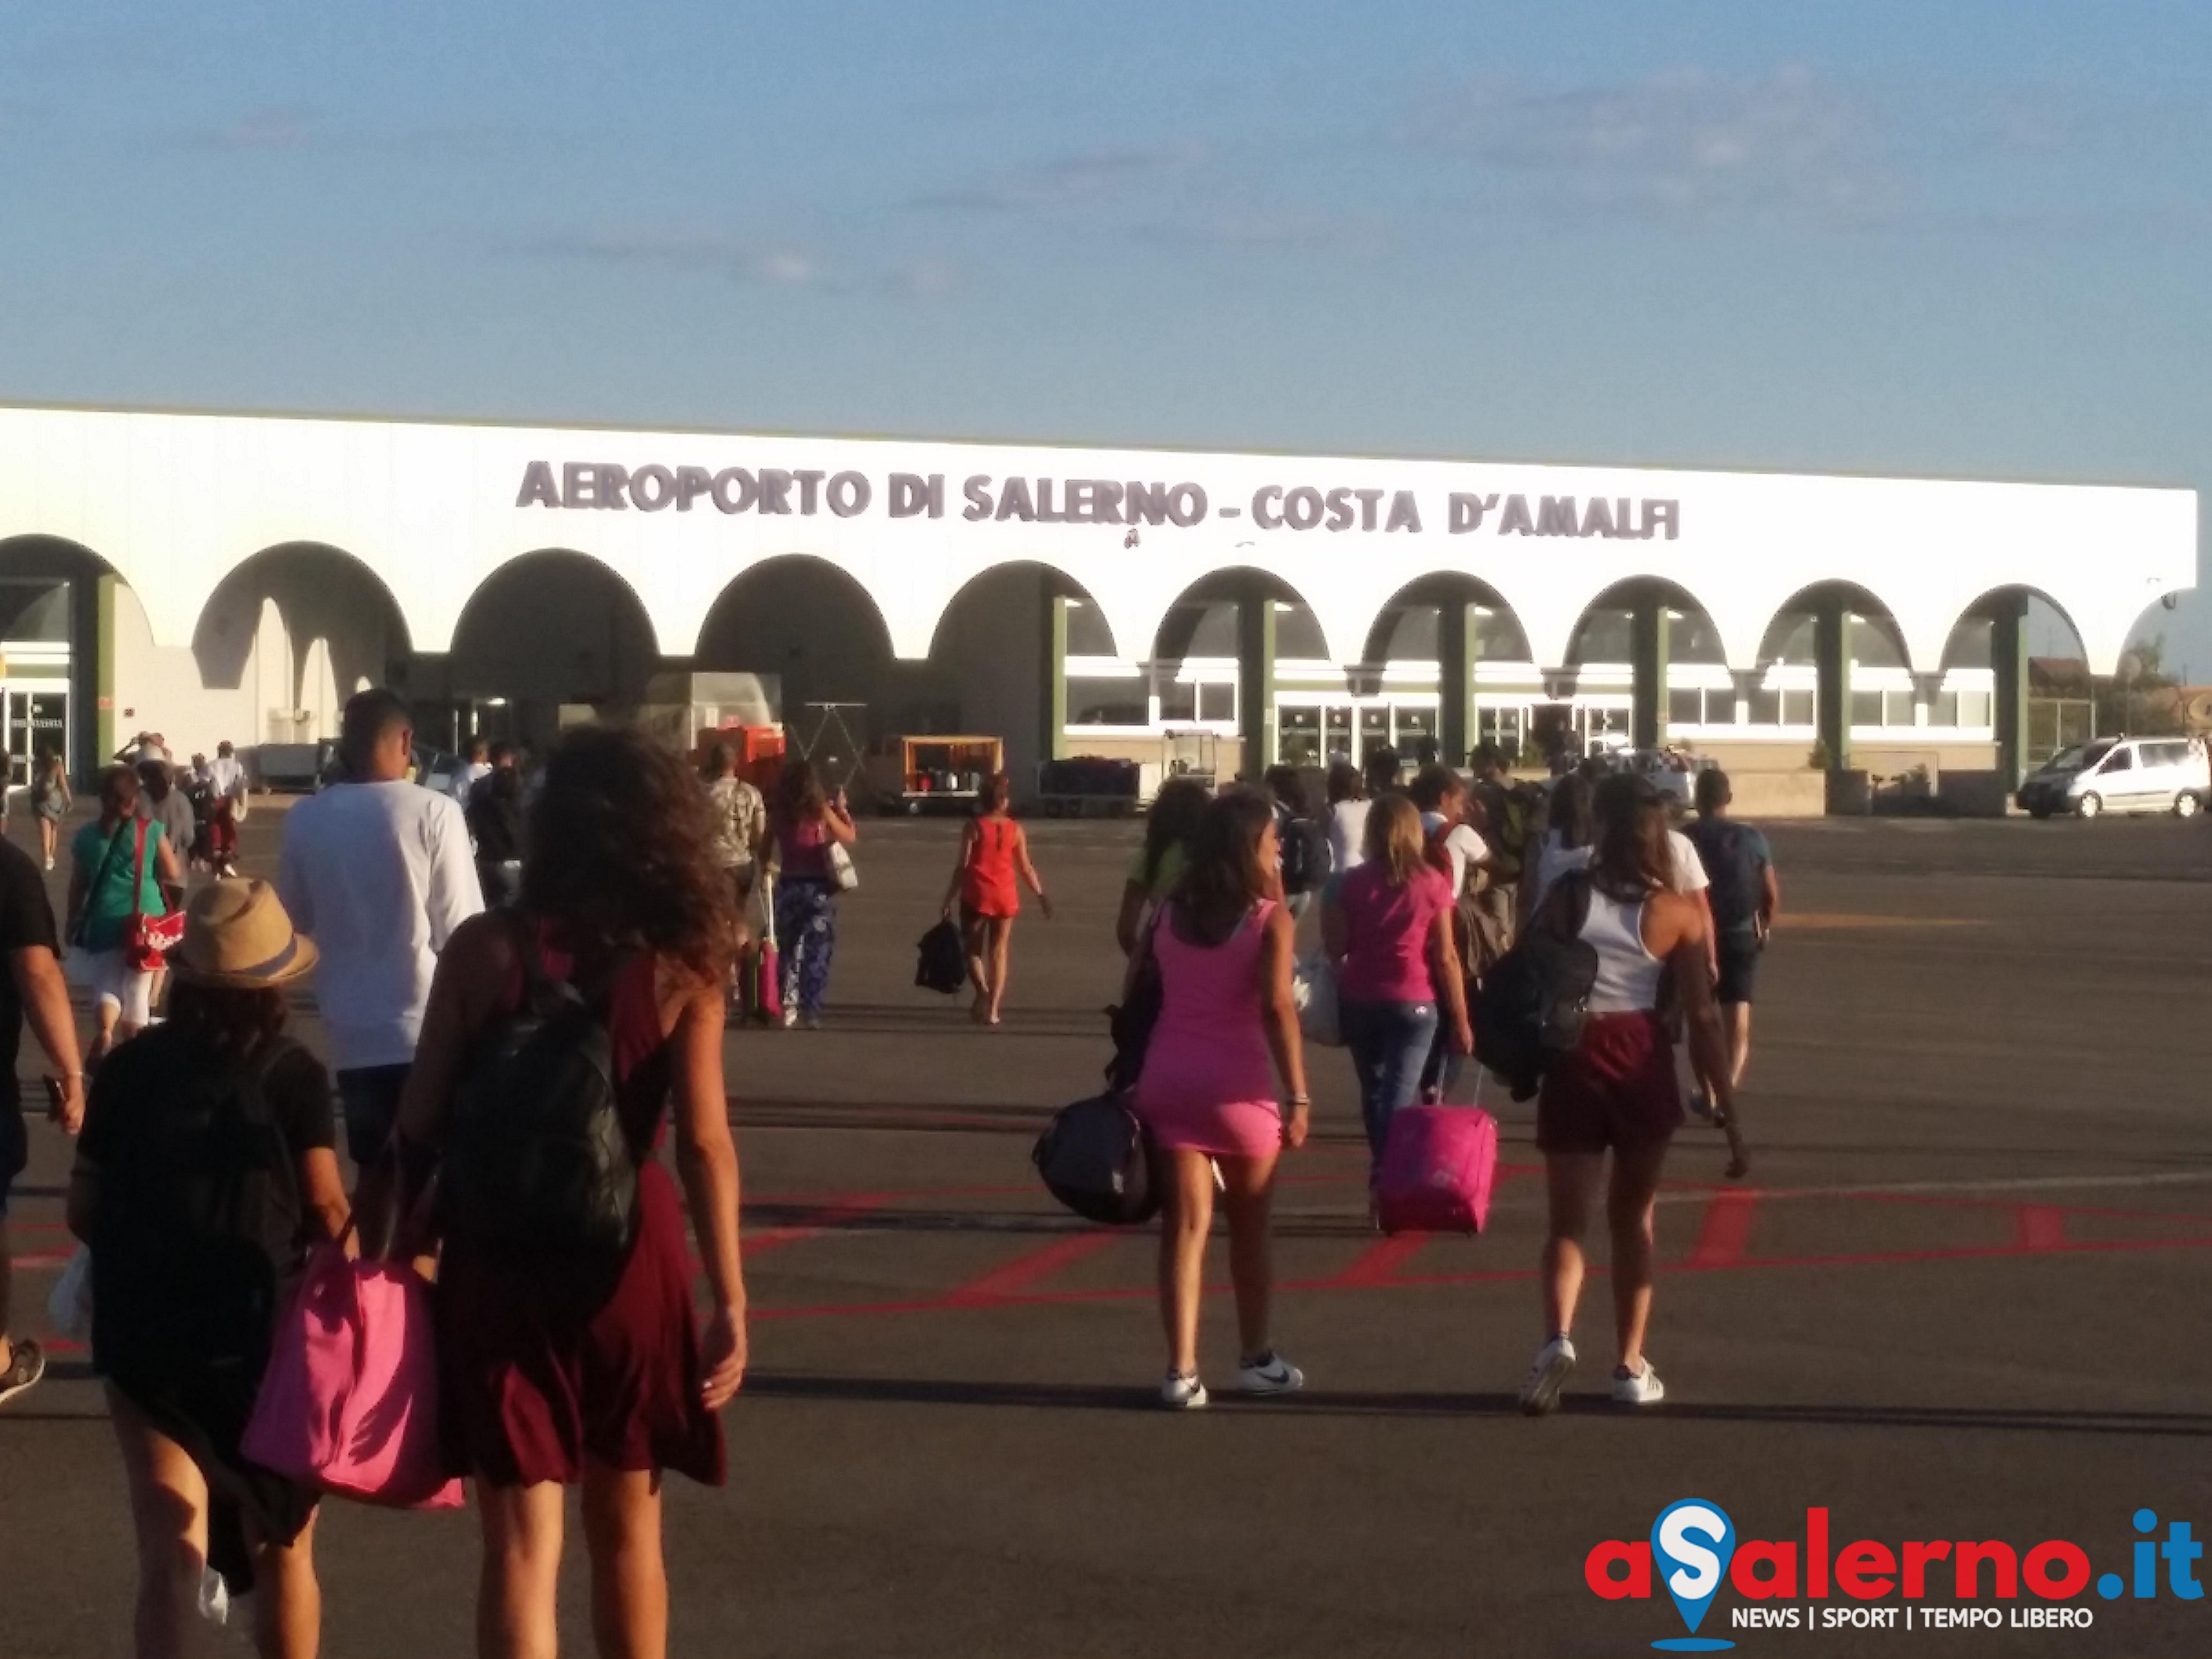 aeroporto salerno costa d'amalfi